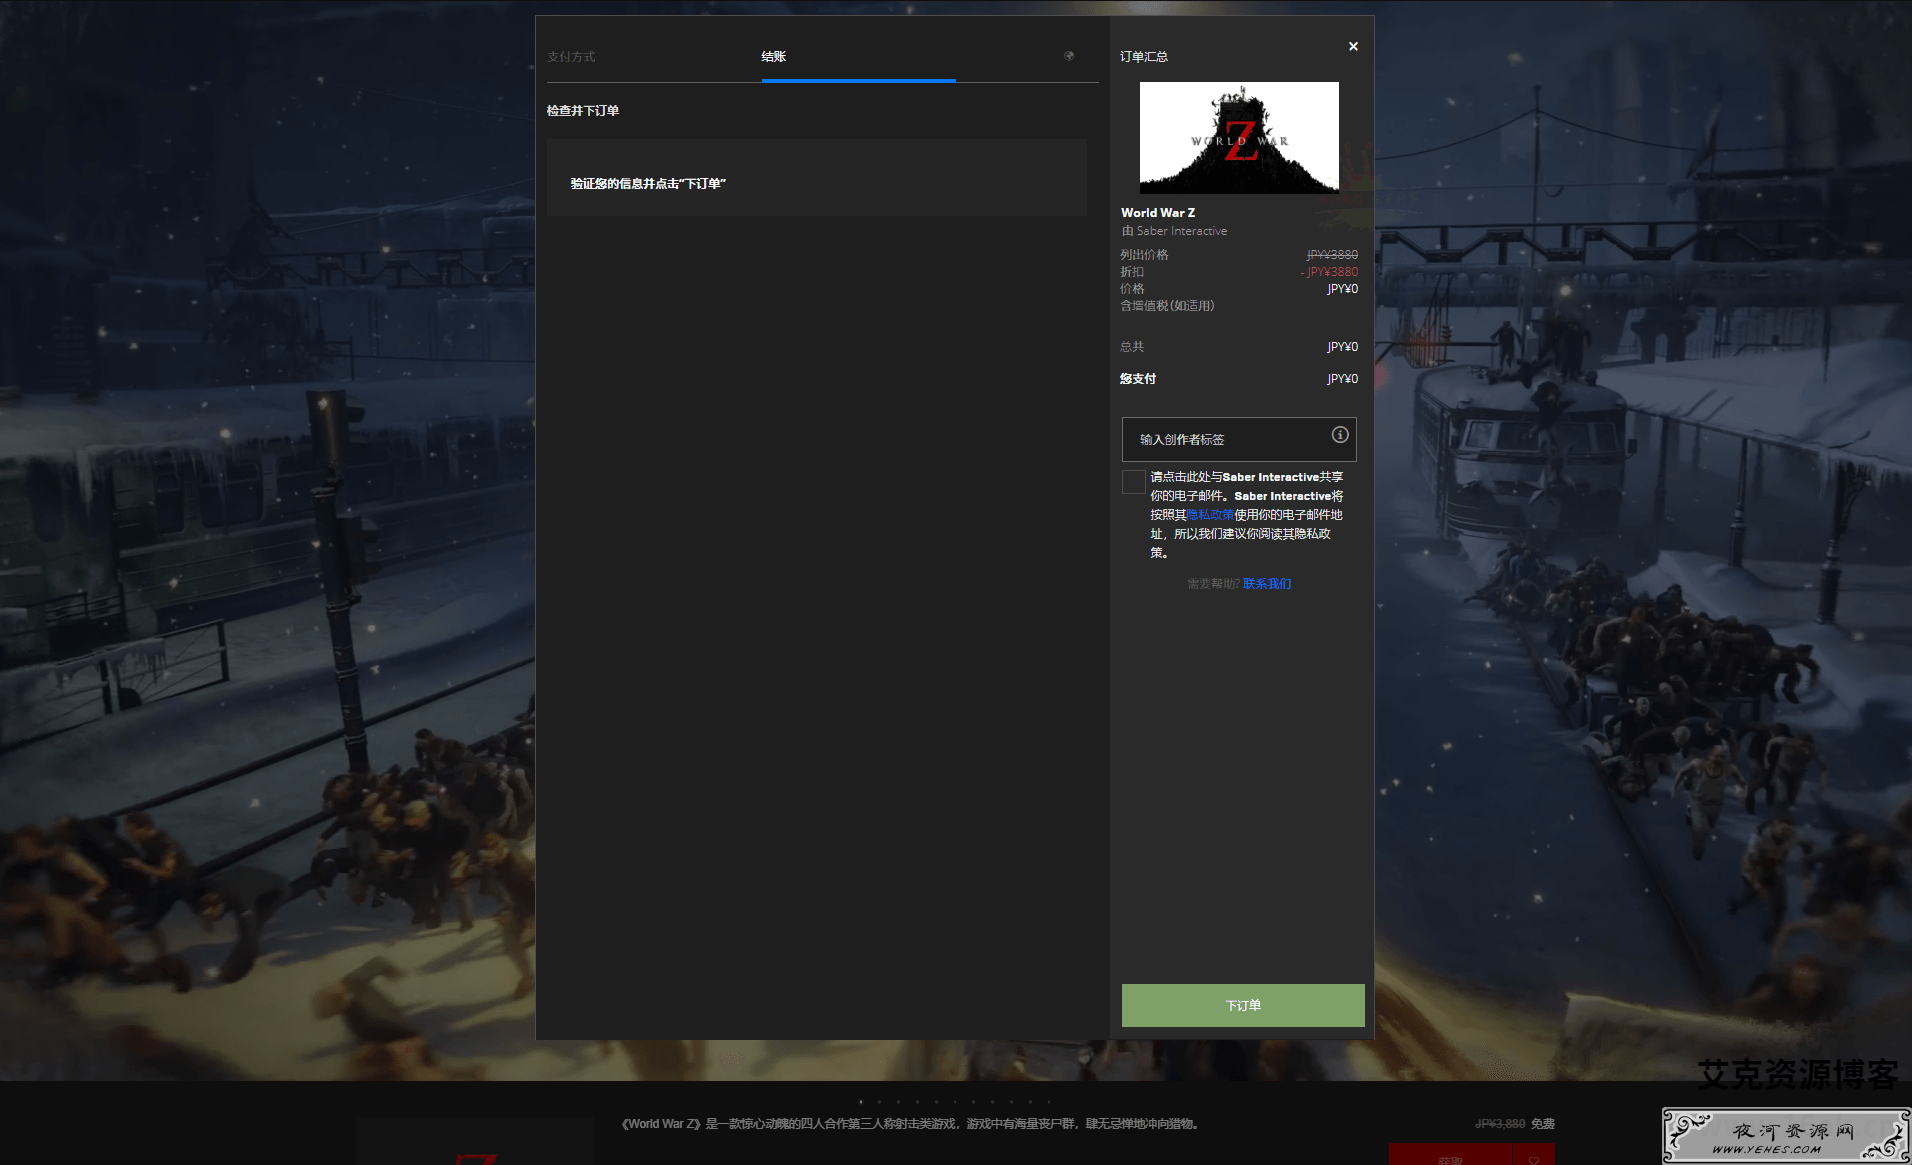 Epic三款免费游戏喜加一包含《僵尸世界大战》《虚构世界》《Tormentor X Punisher》